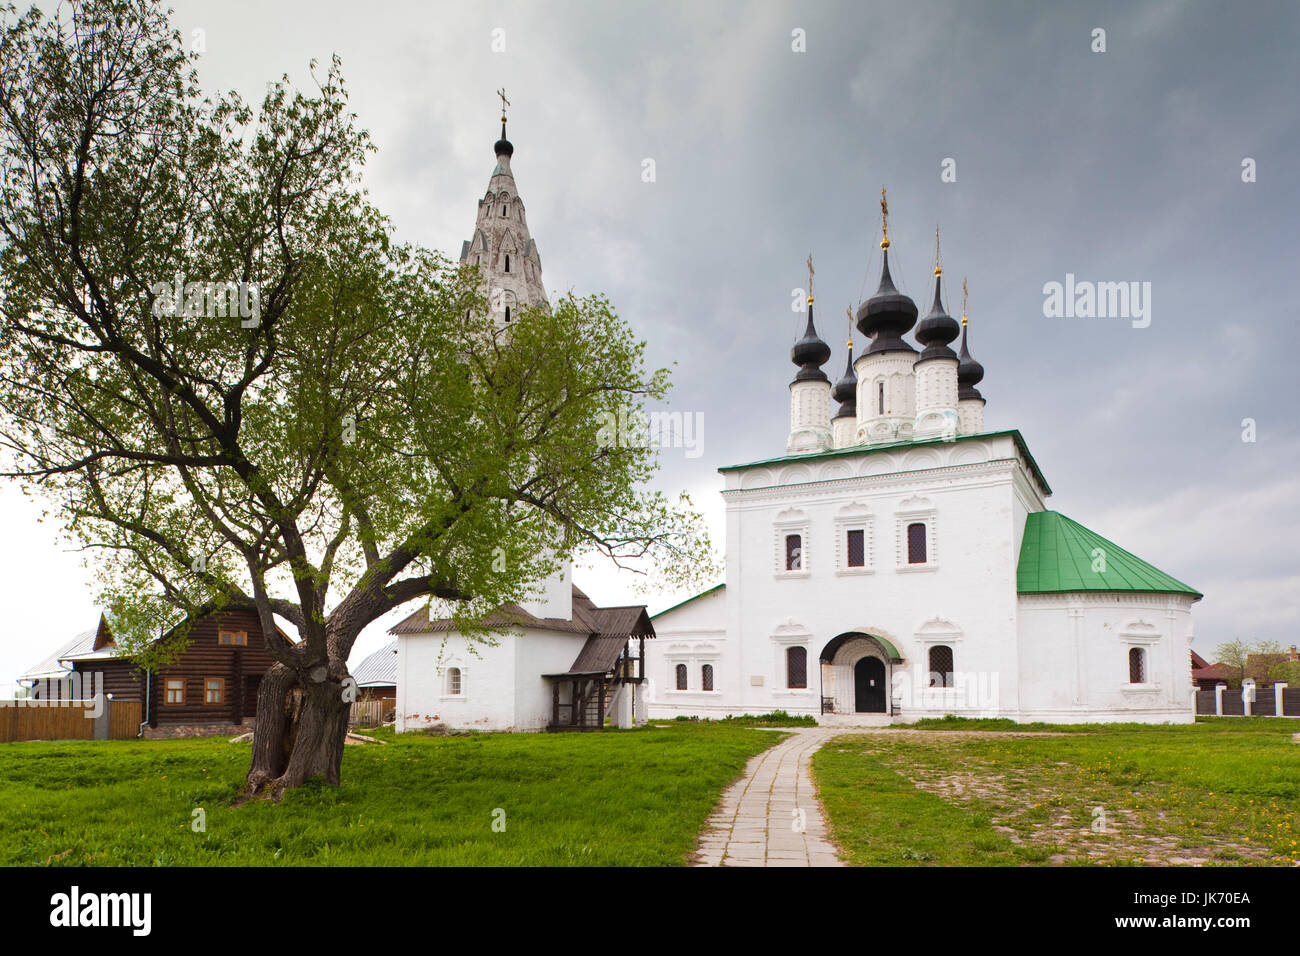 Russia, Vladimir Oblast, Golden Ring, Suzdal, Alexandrovsky Convent - Stock Image